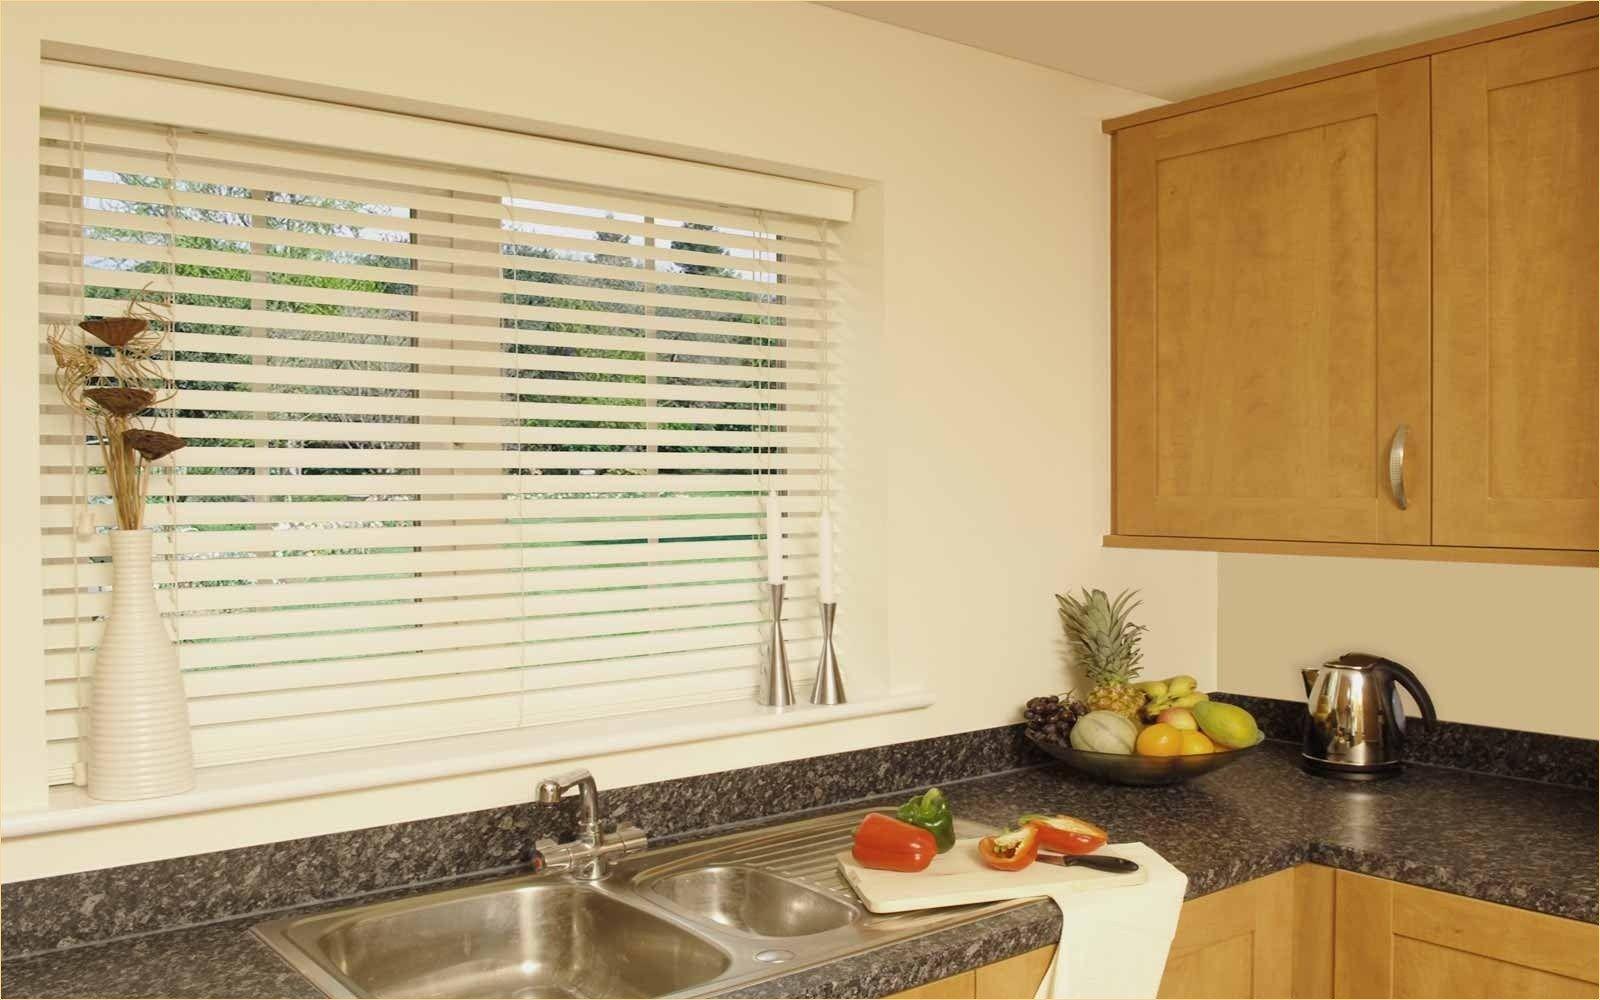 51 Stunning Oak Kitchen With Blinds Ideas Kitchen Blinds